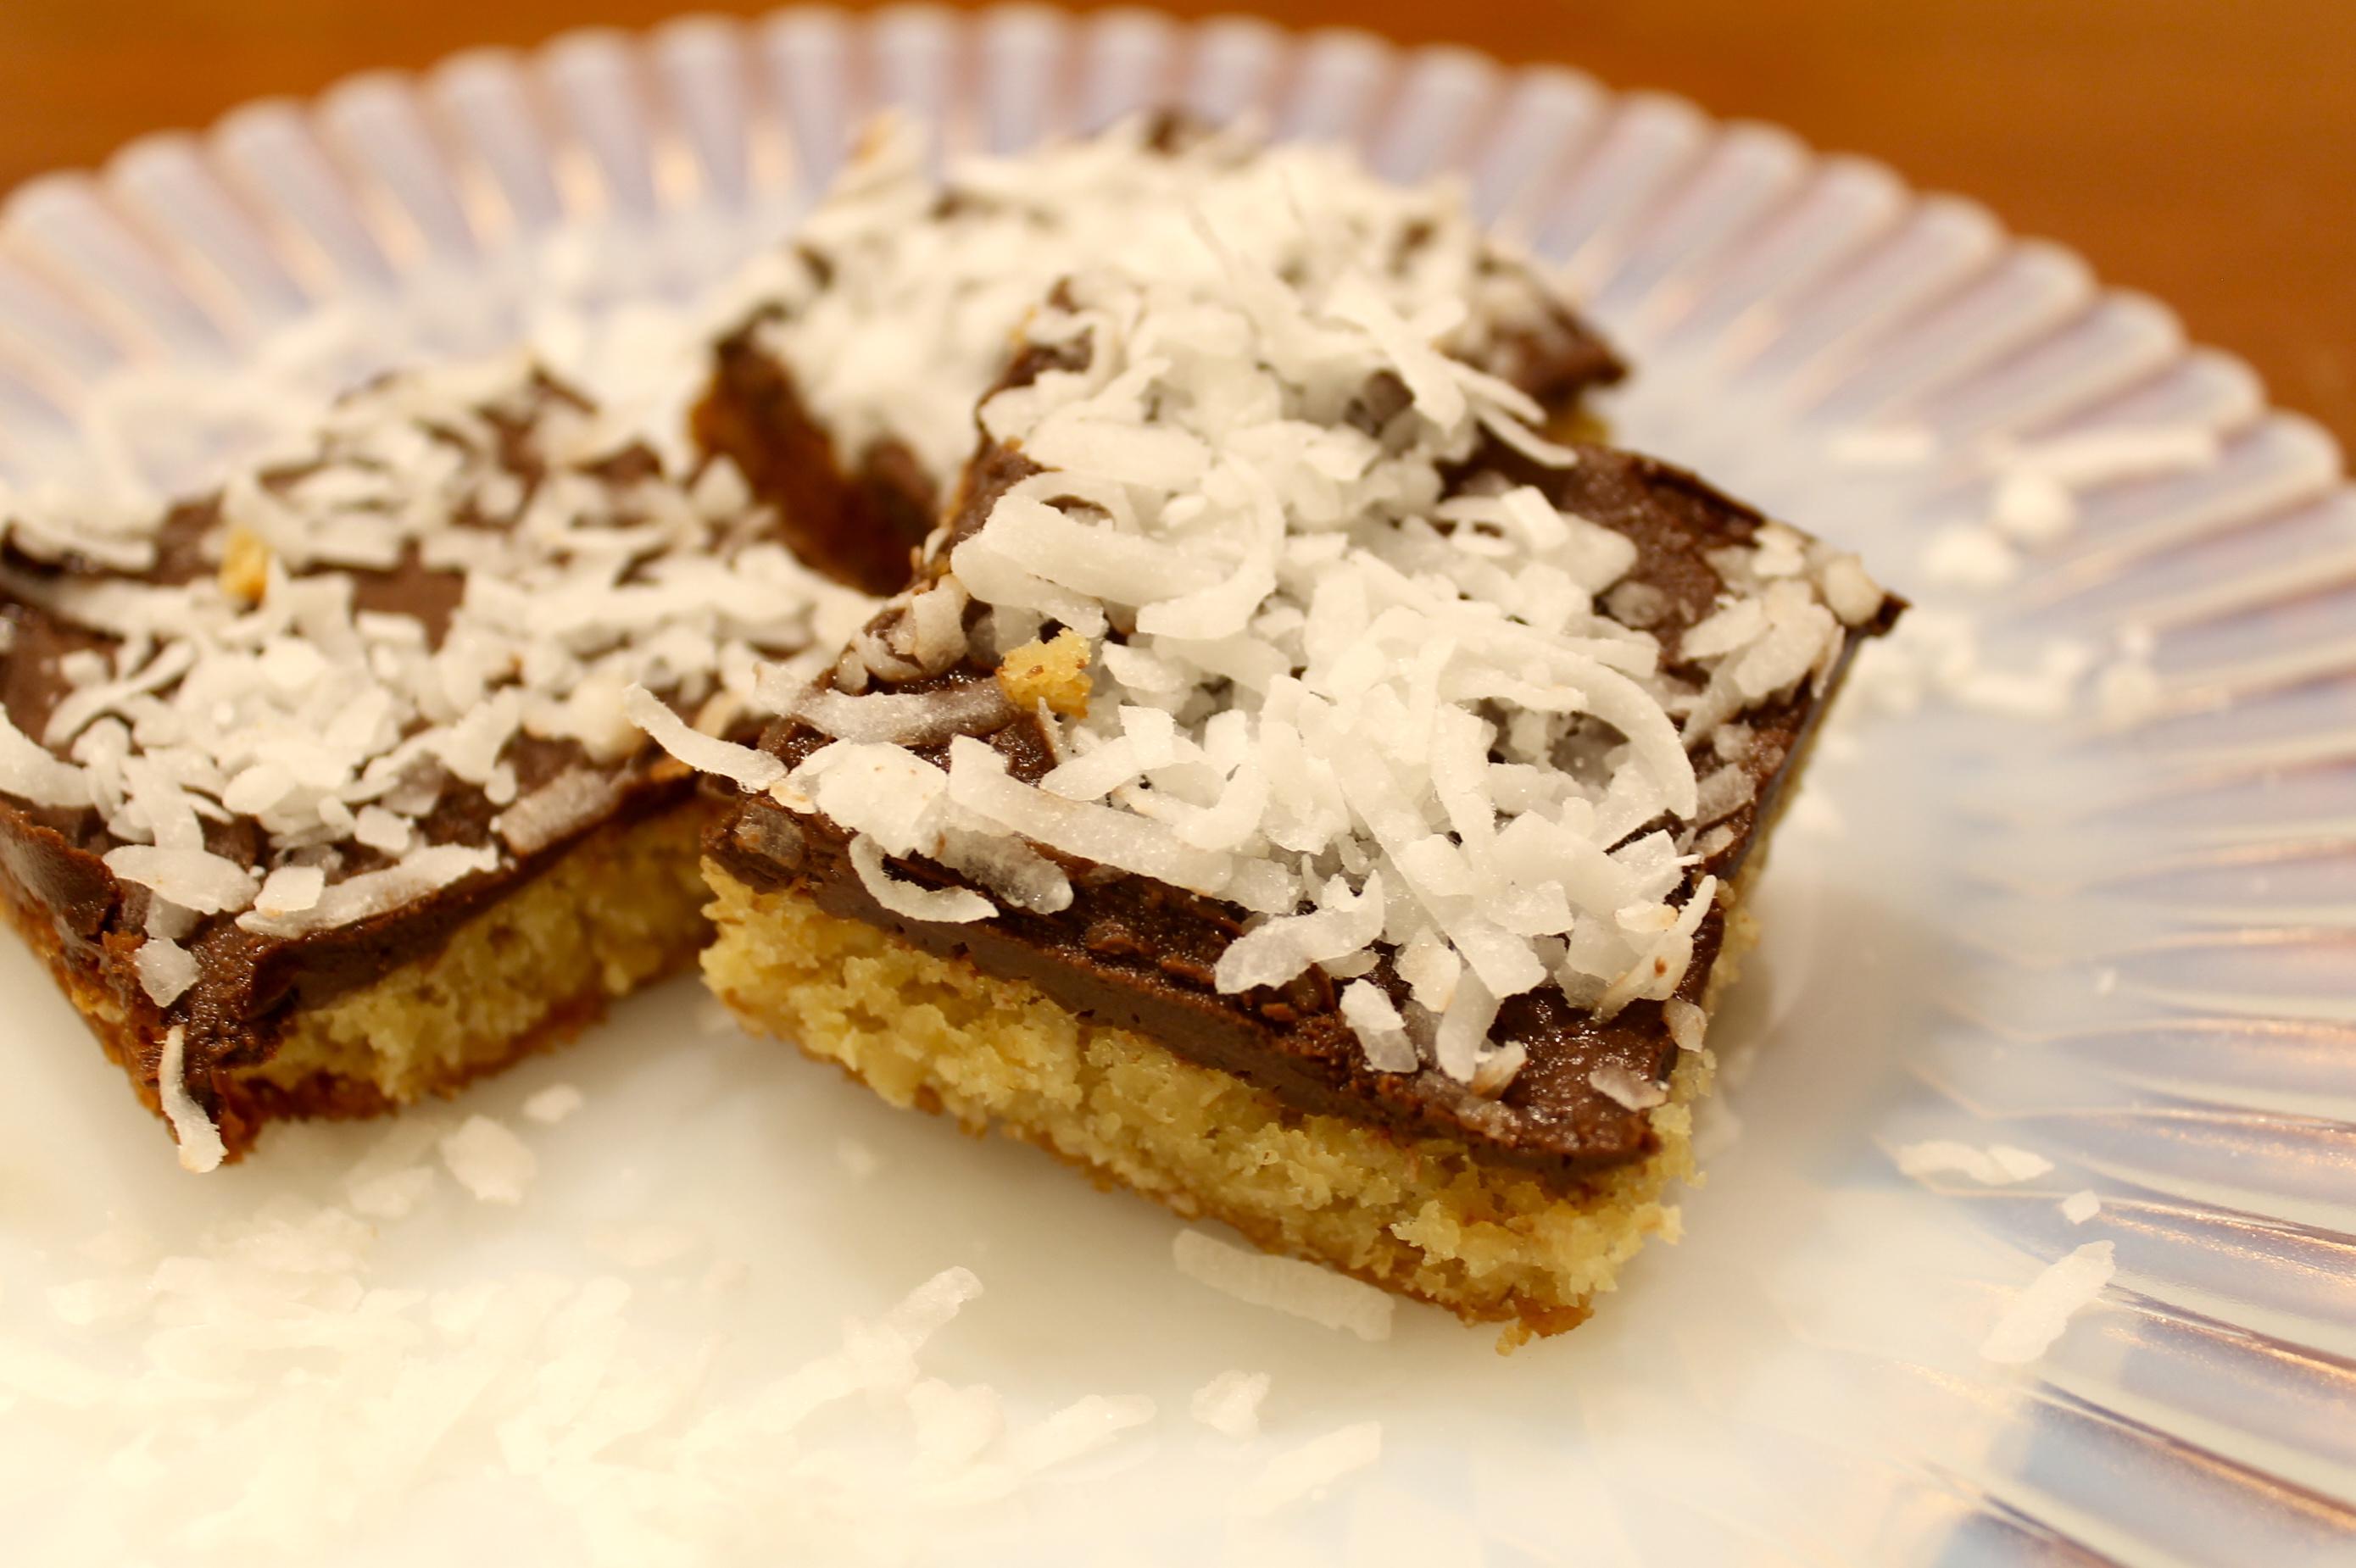 Bars -  Oatmeal Bars Recipe to Feed a Crowd